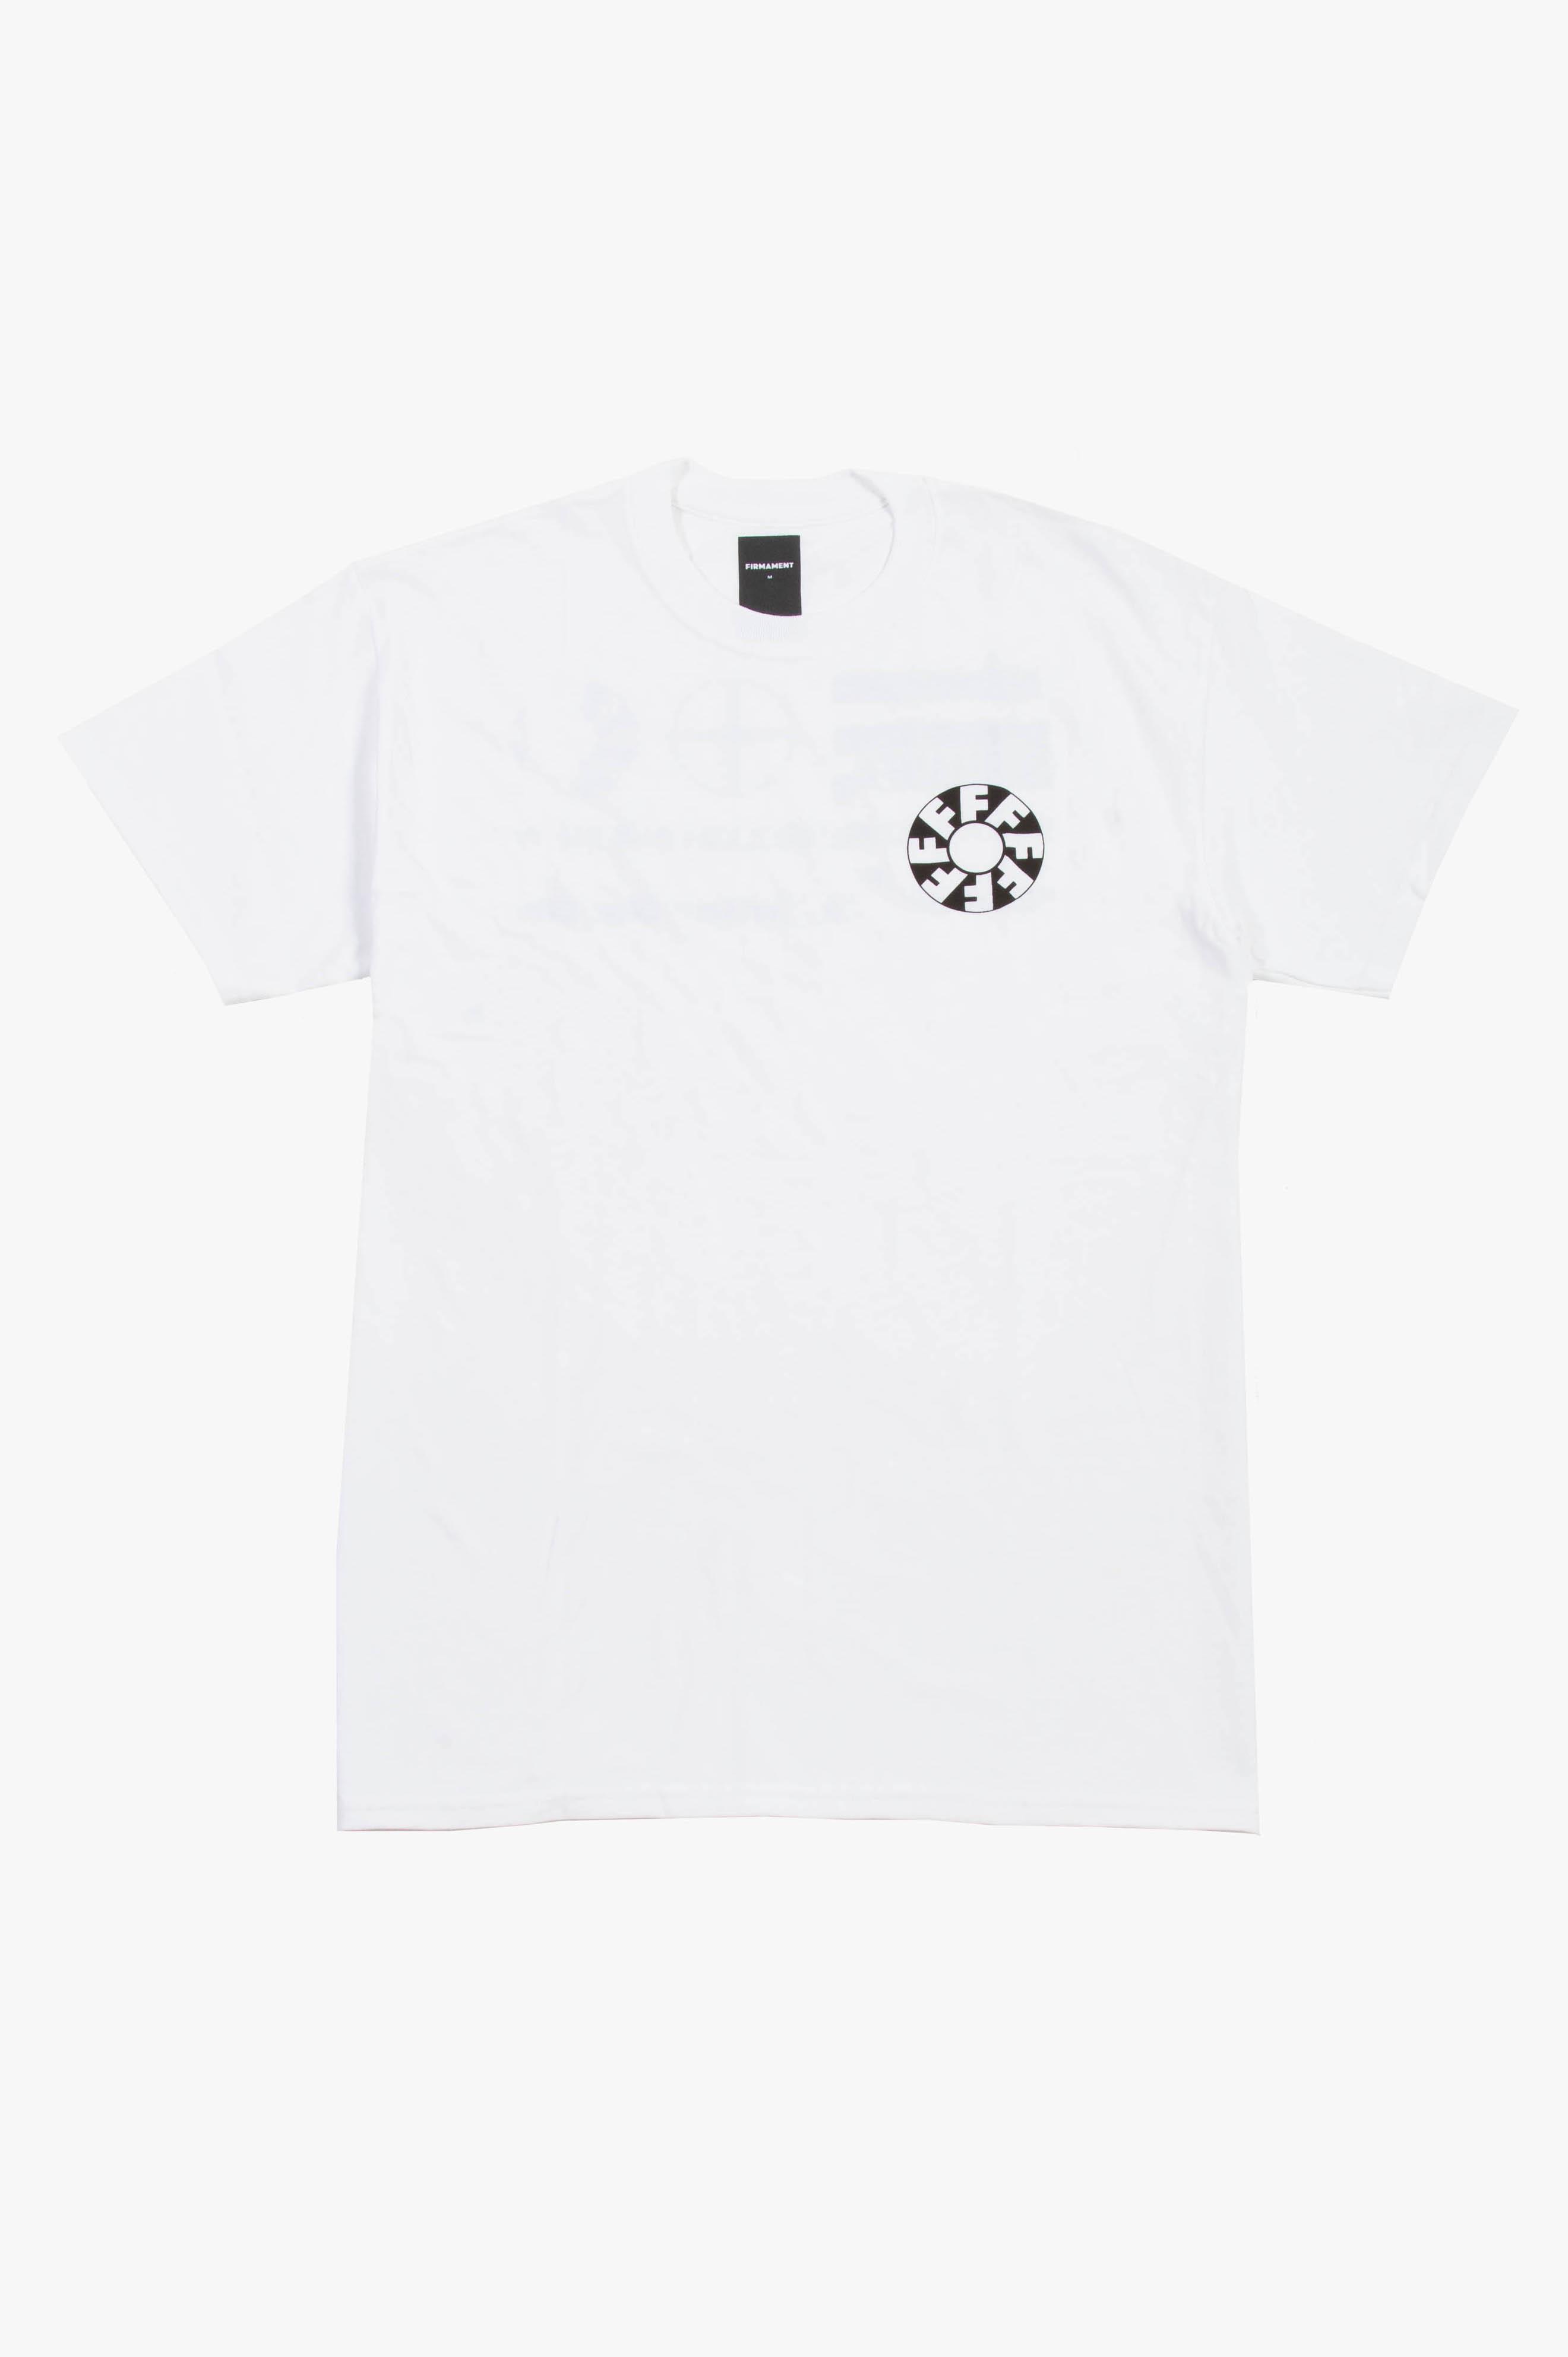 ITI T-Shirt White